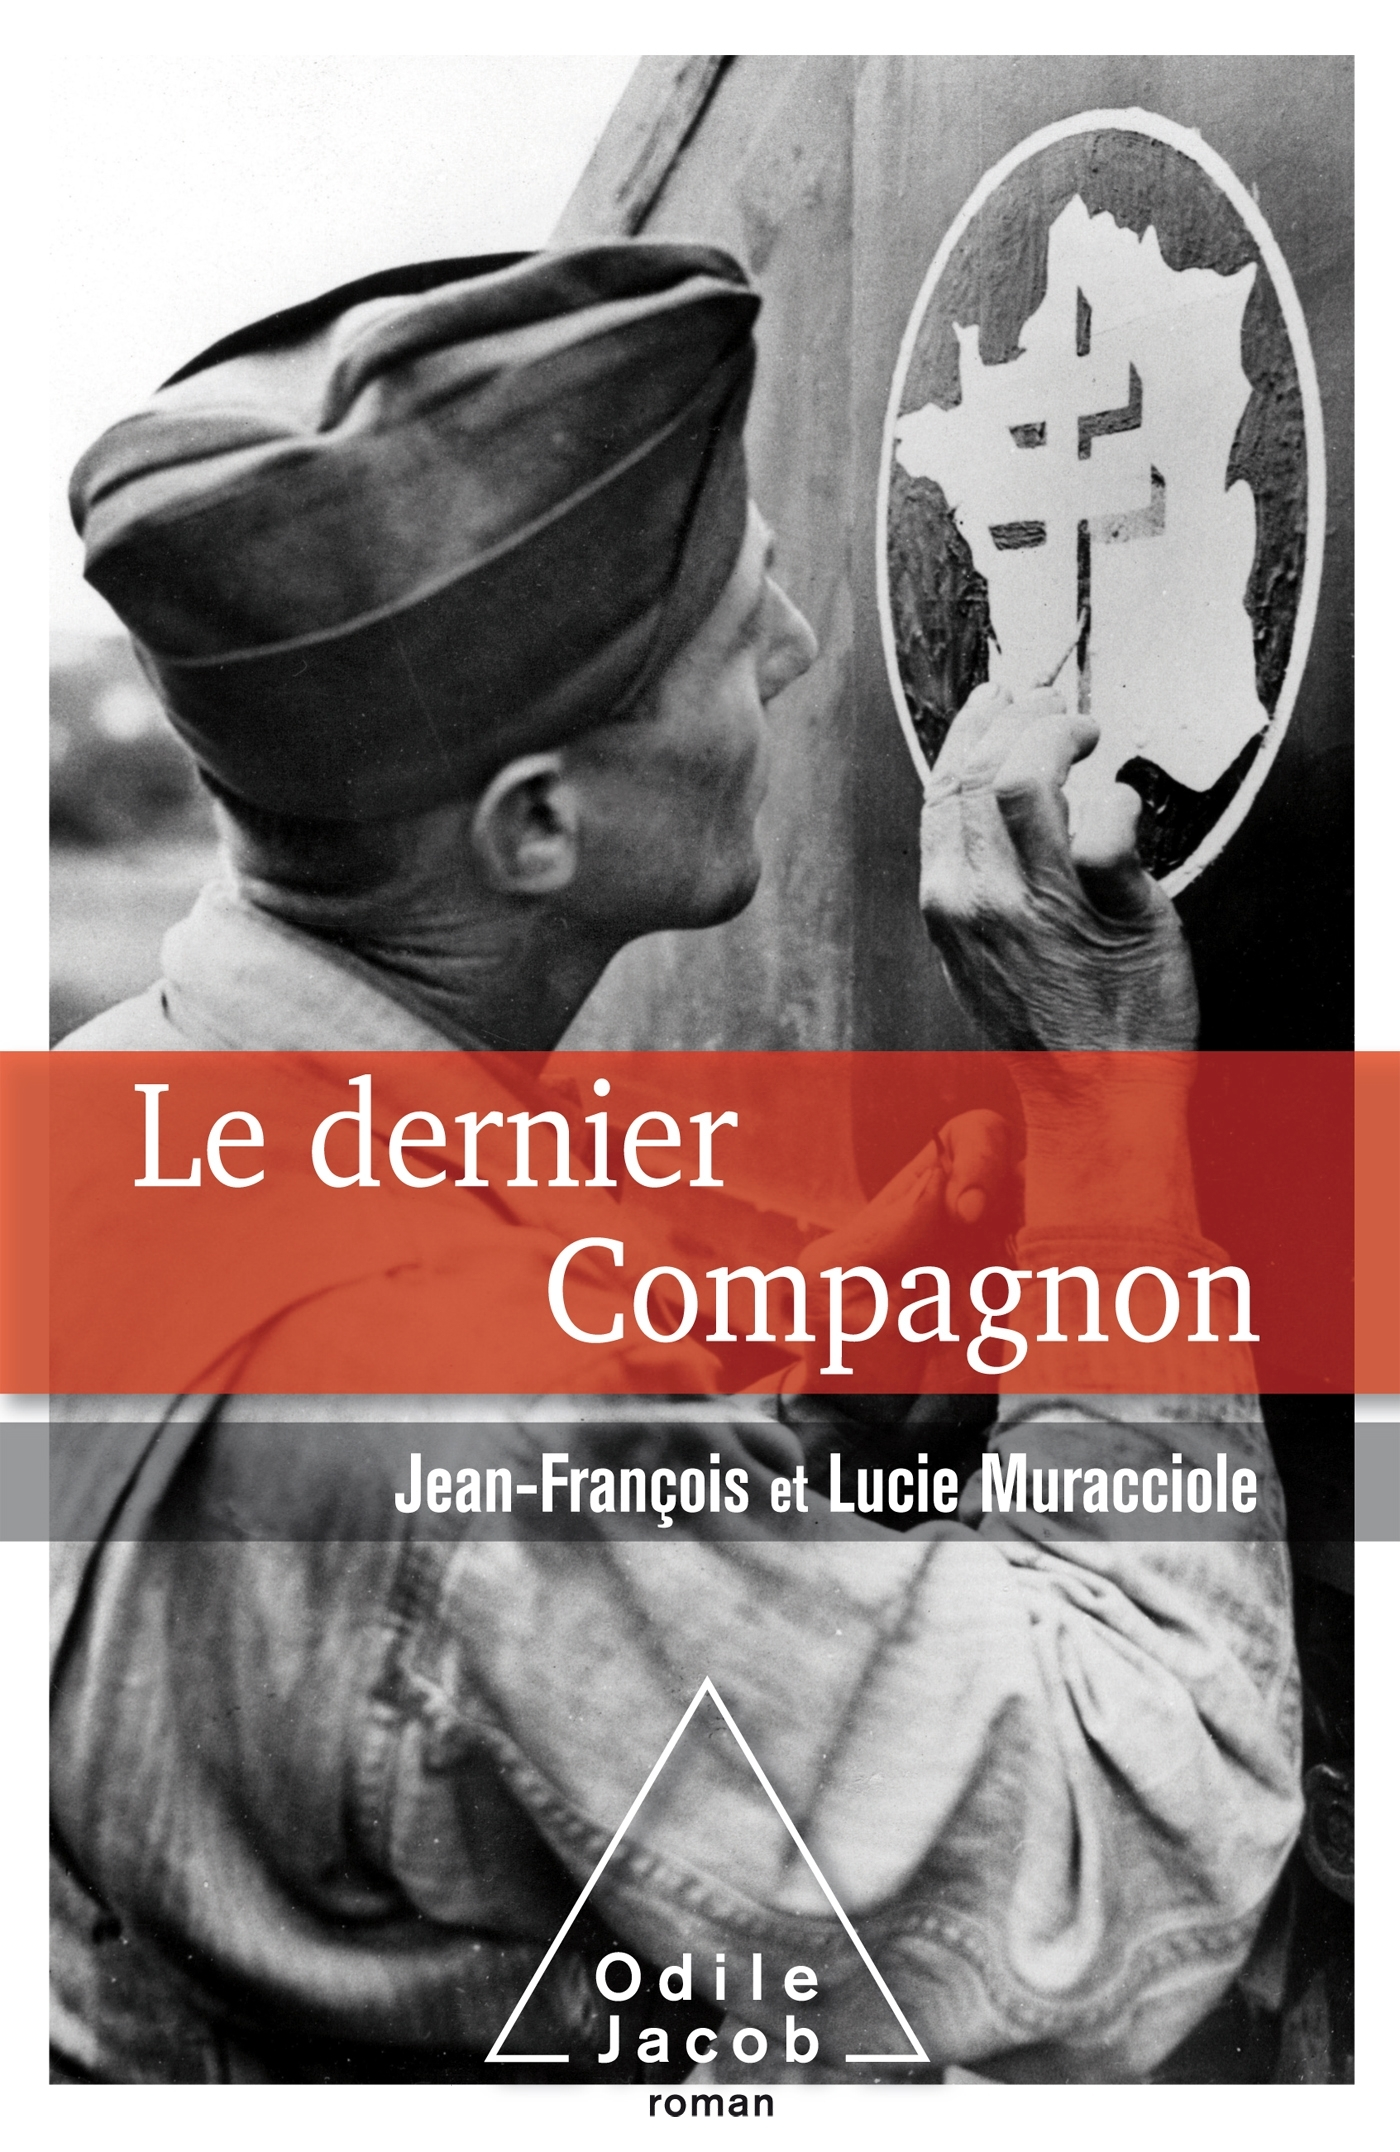 LE DERNIER COMPAGNON